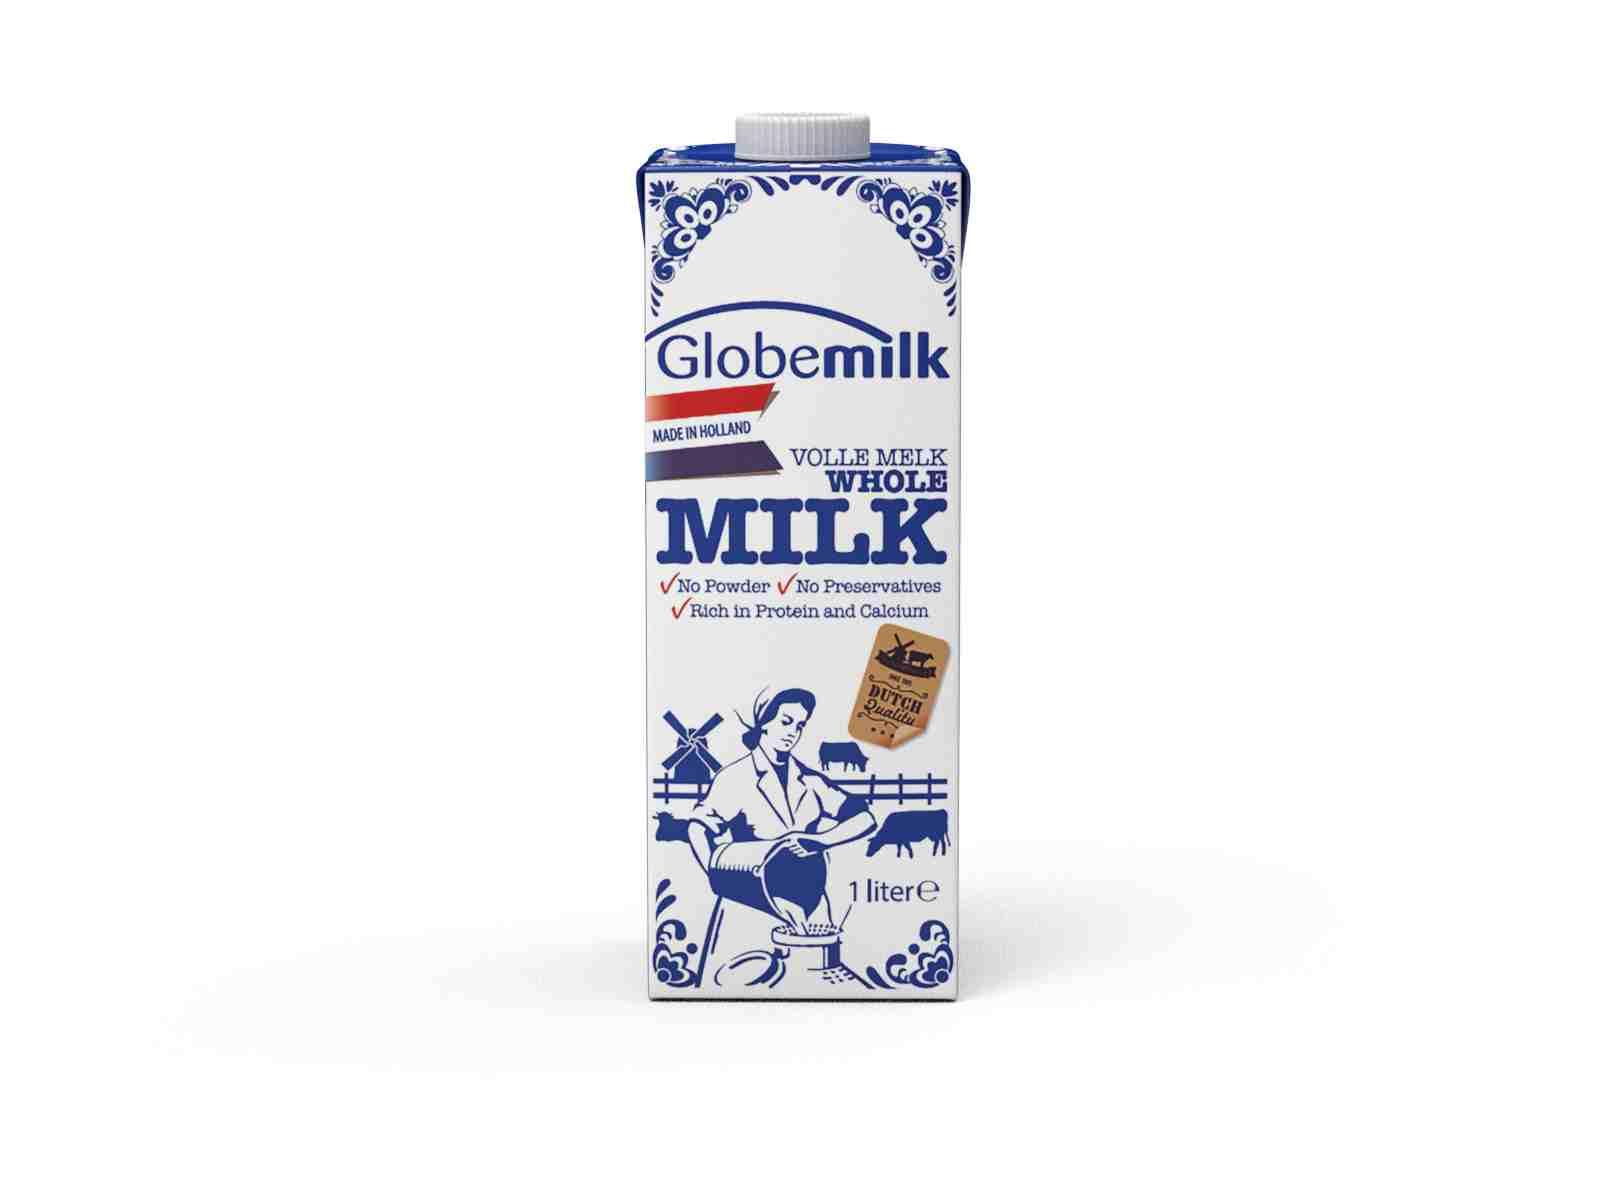 Melk volle uht 6x1l